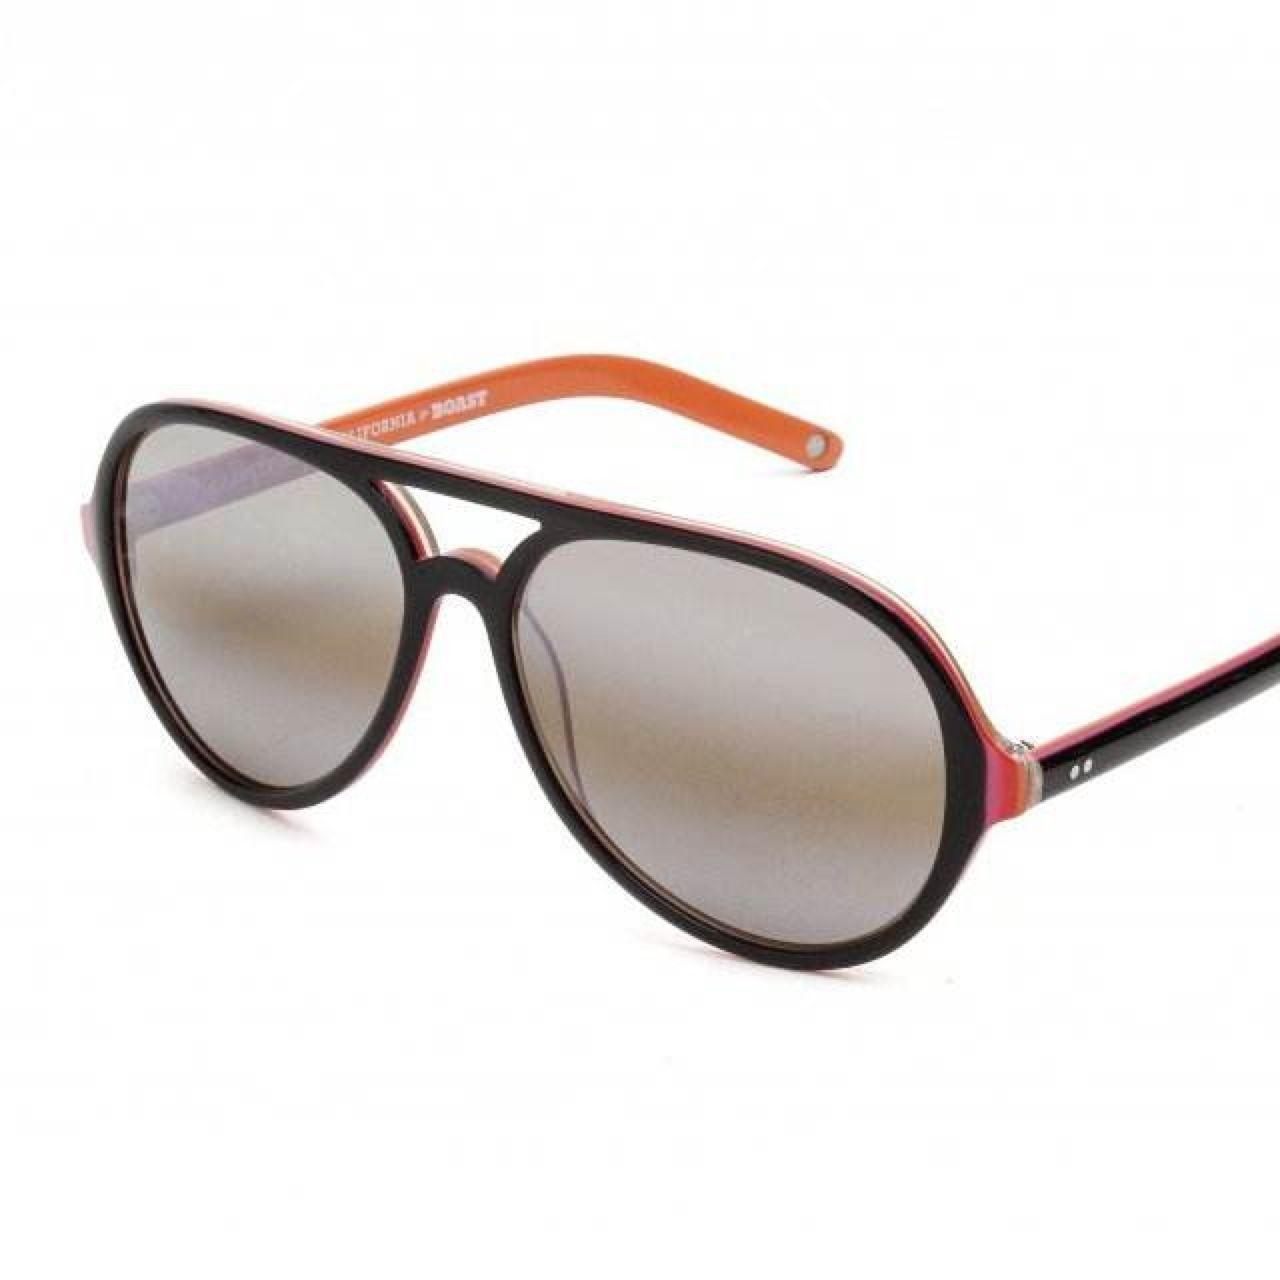 Black orange sunglasses by glco orange sunglasses